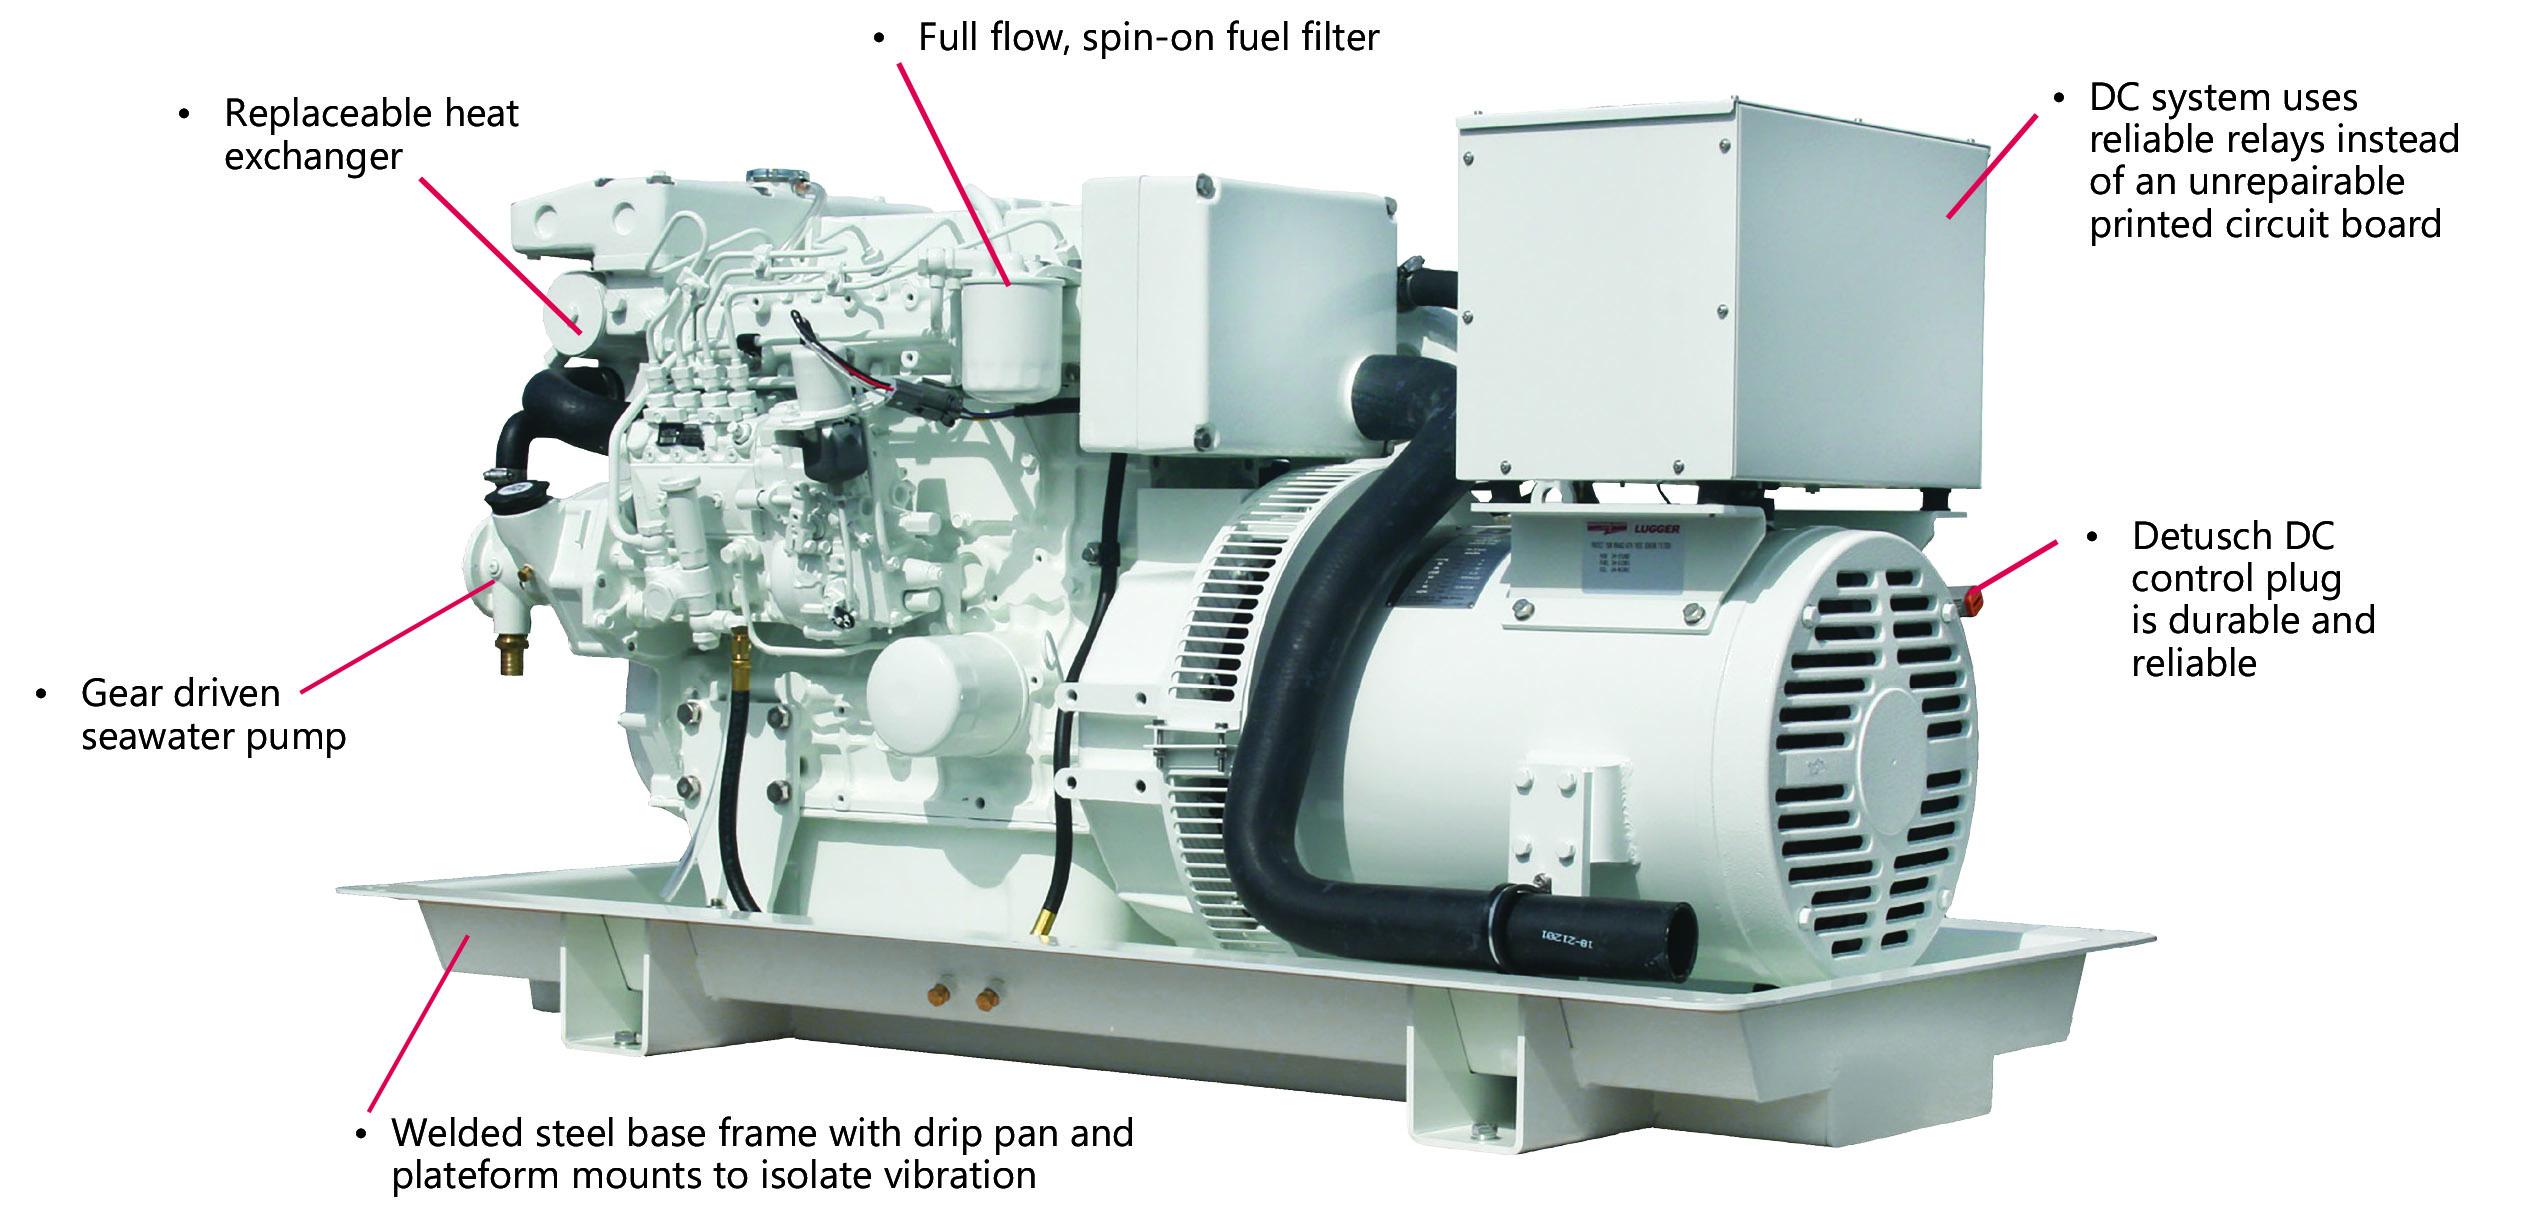 M944W3 – 30 kW 26 kW – Northern Lights Marine Generators And